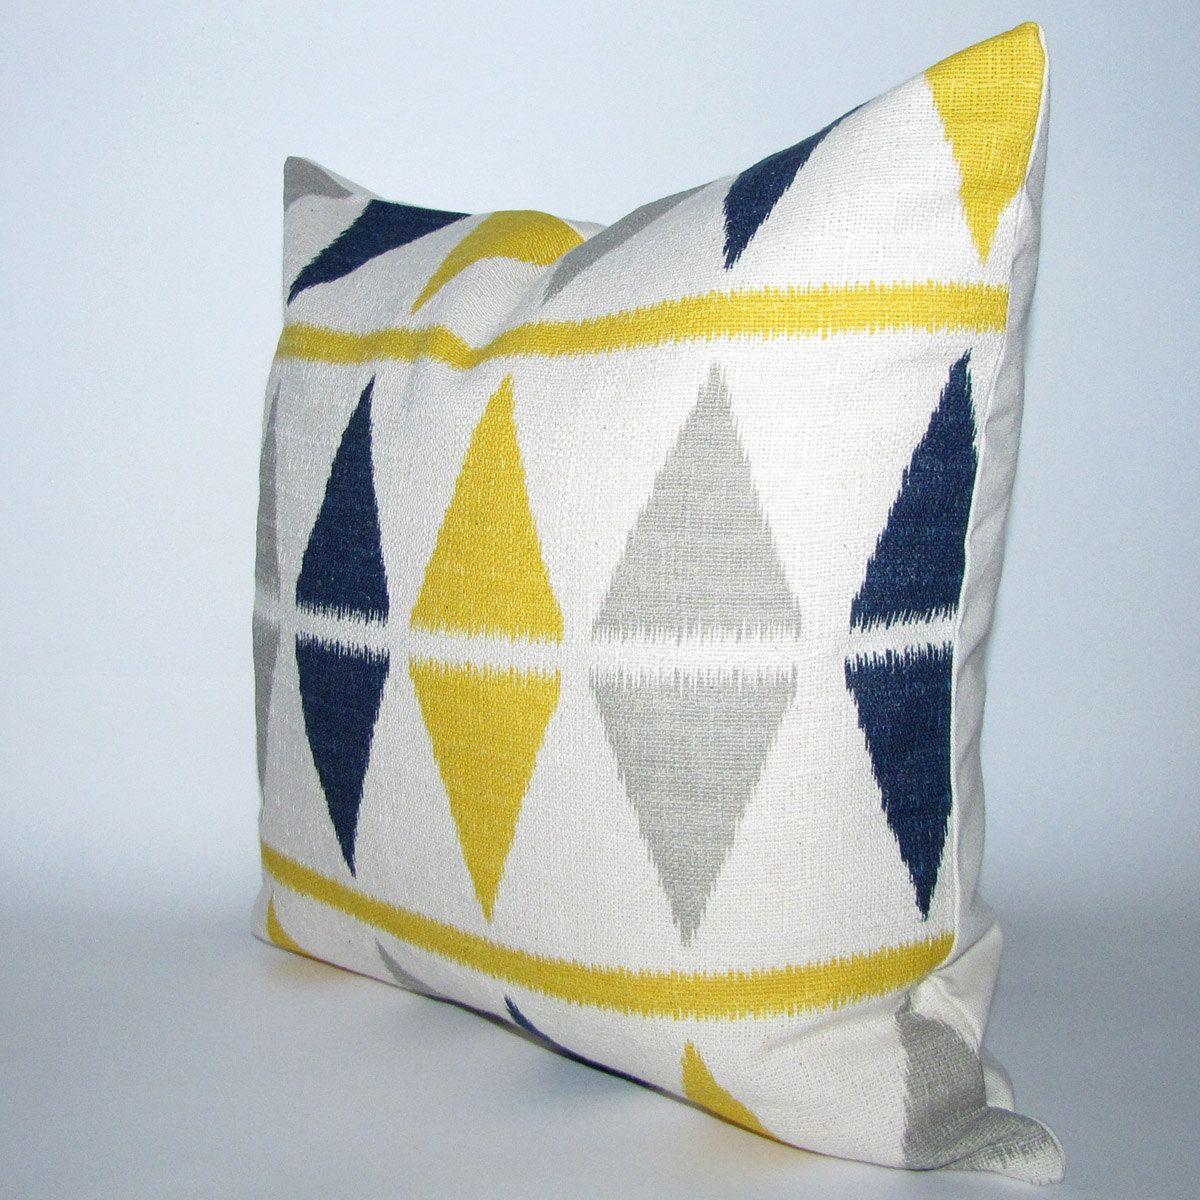 Etsy Yellow Throw Pillow : BLUE and YELLOW pillow cover - ikat chevron print - 16x16. $22.00, via Etsy. ?? Pinterest ...